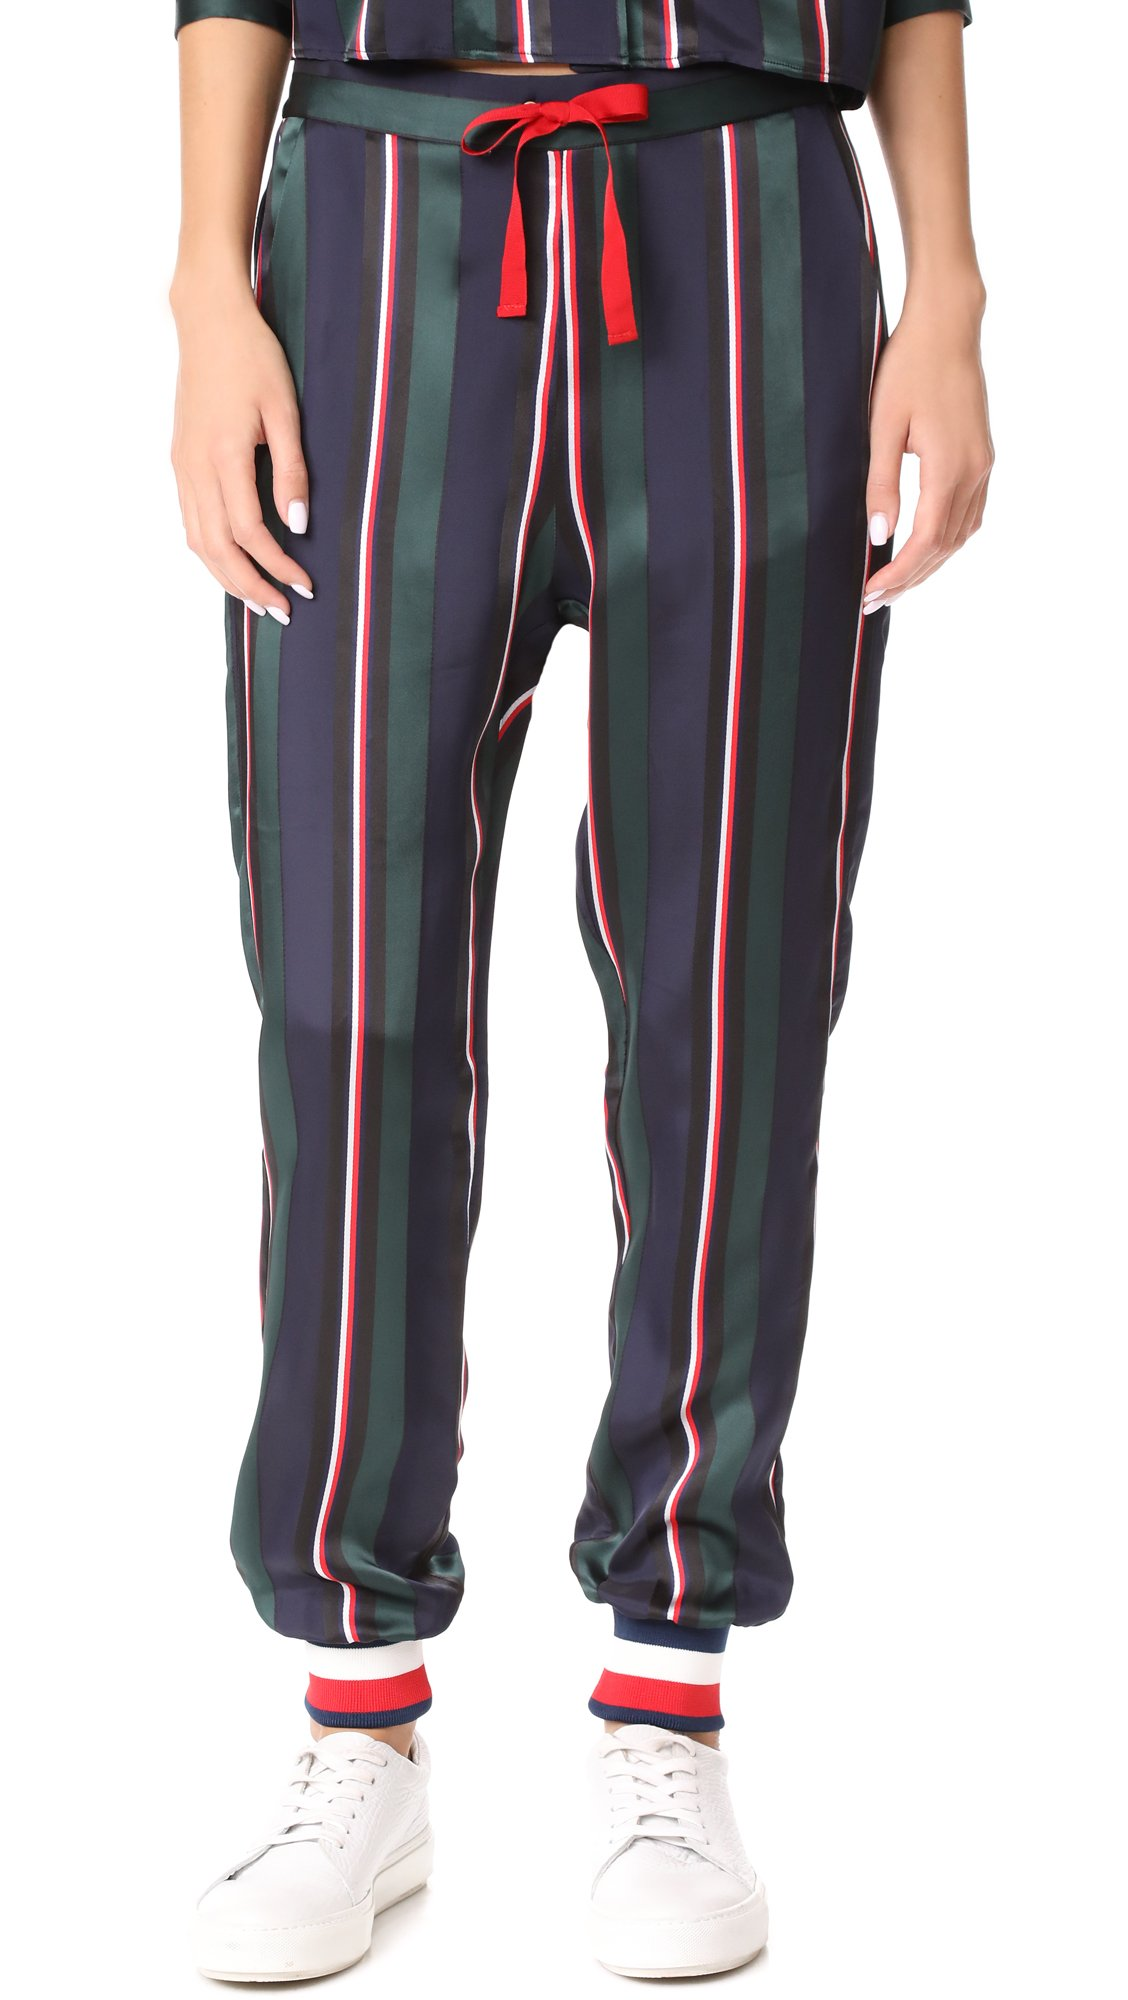 Hilfiger Collection Women's Pull On Pyjama Pants, Peacoat/Multi, 8